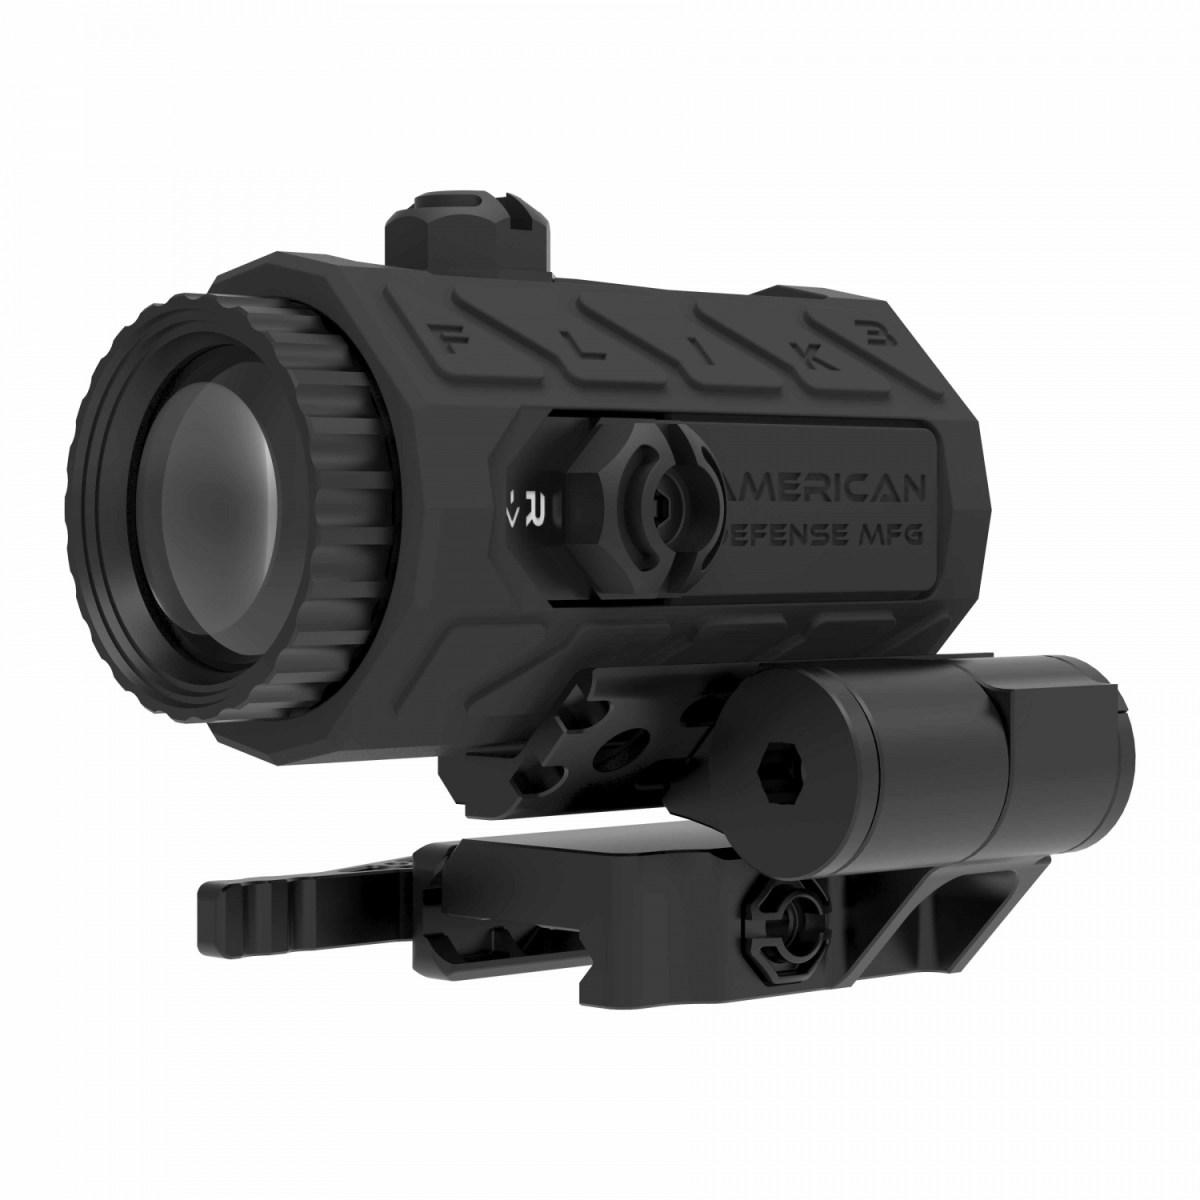 magnifier-3x-down.jpg